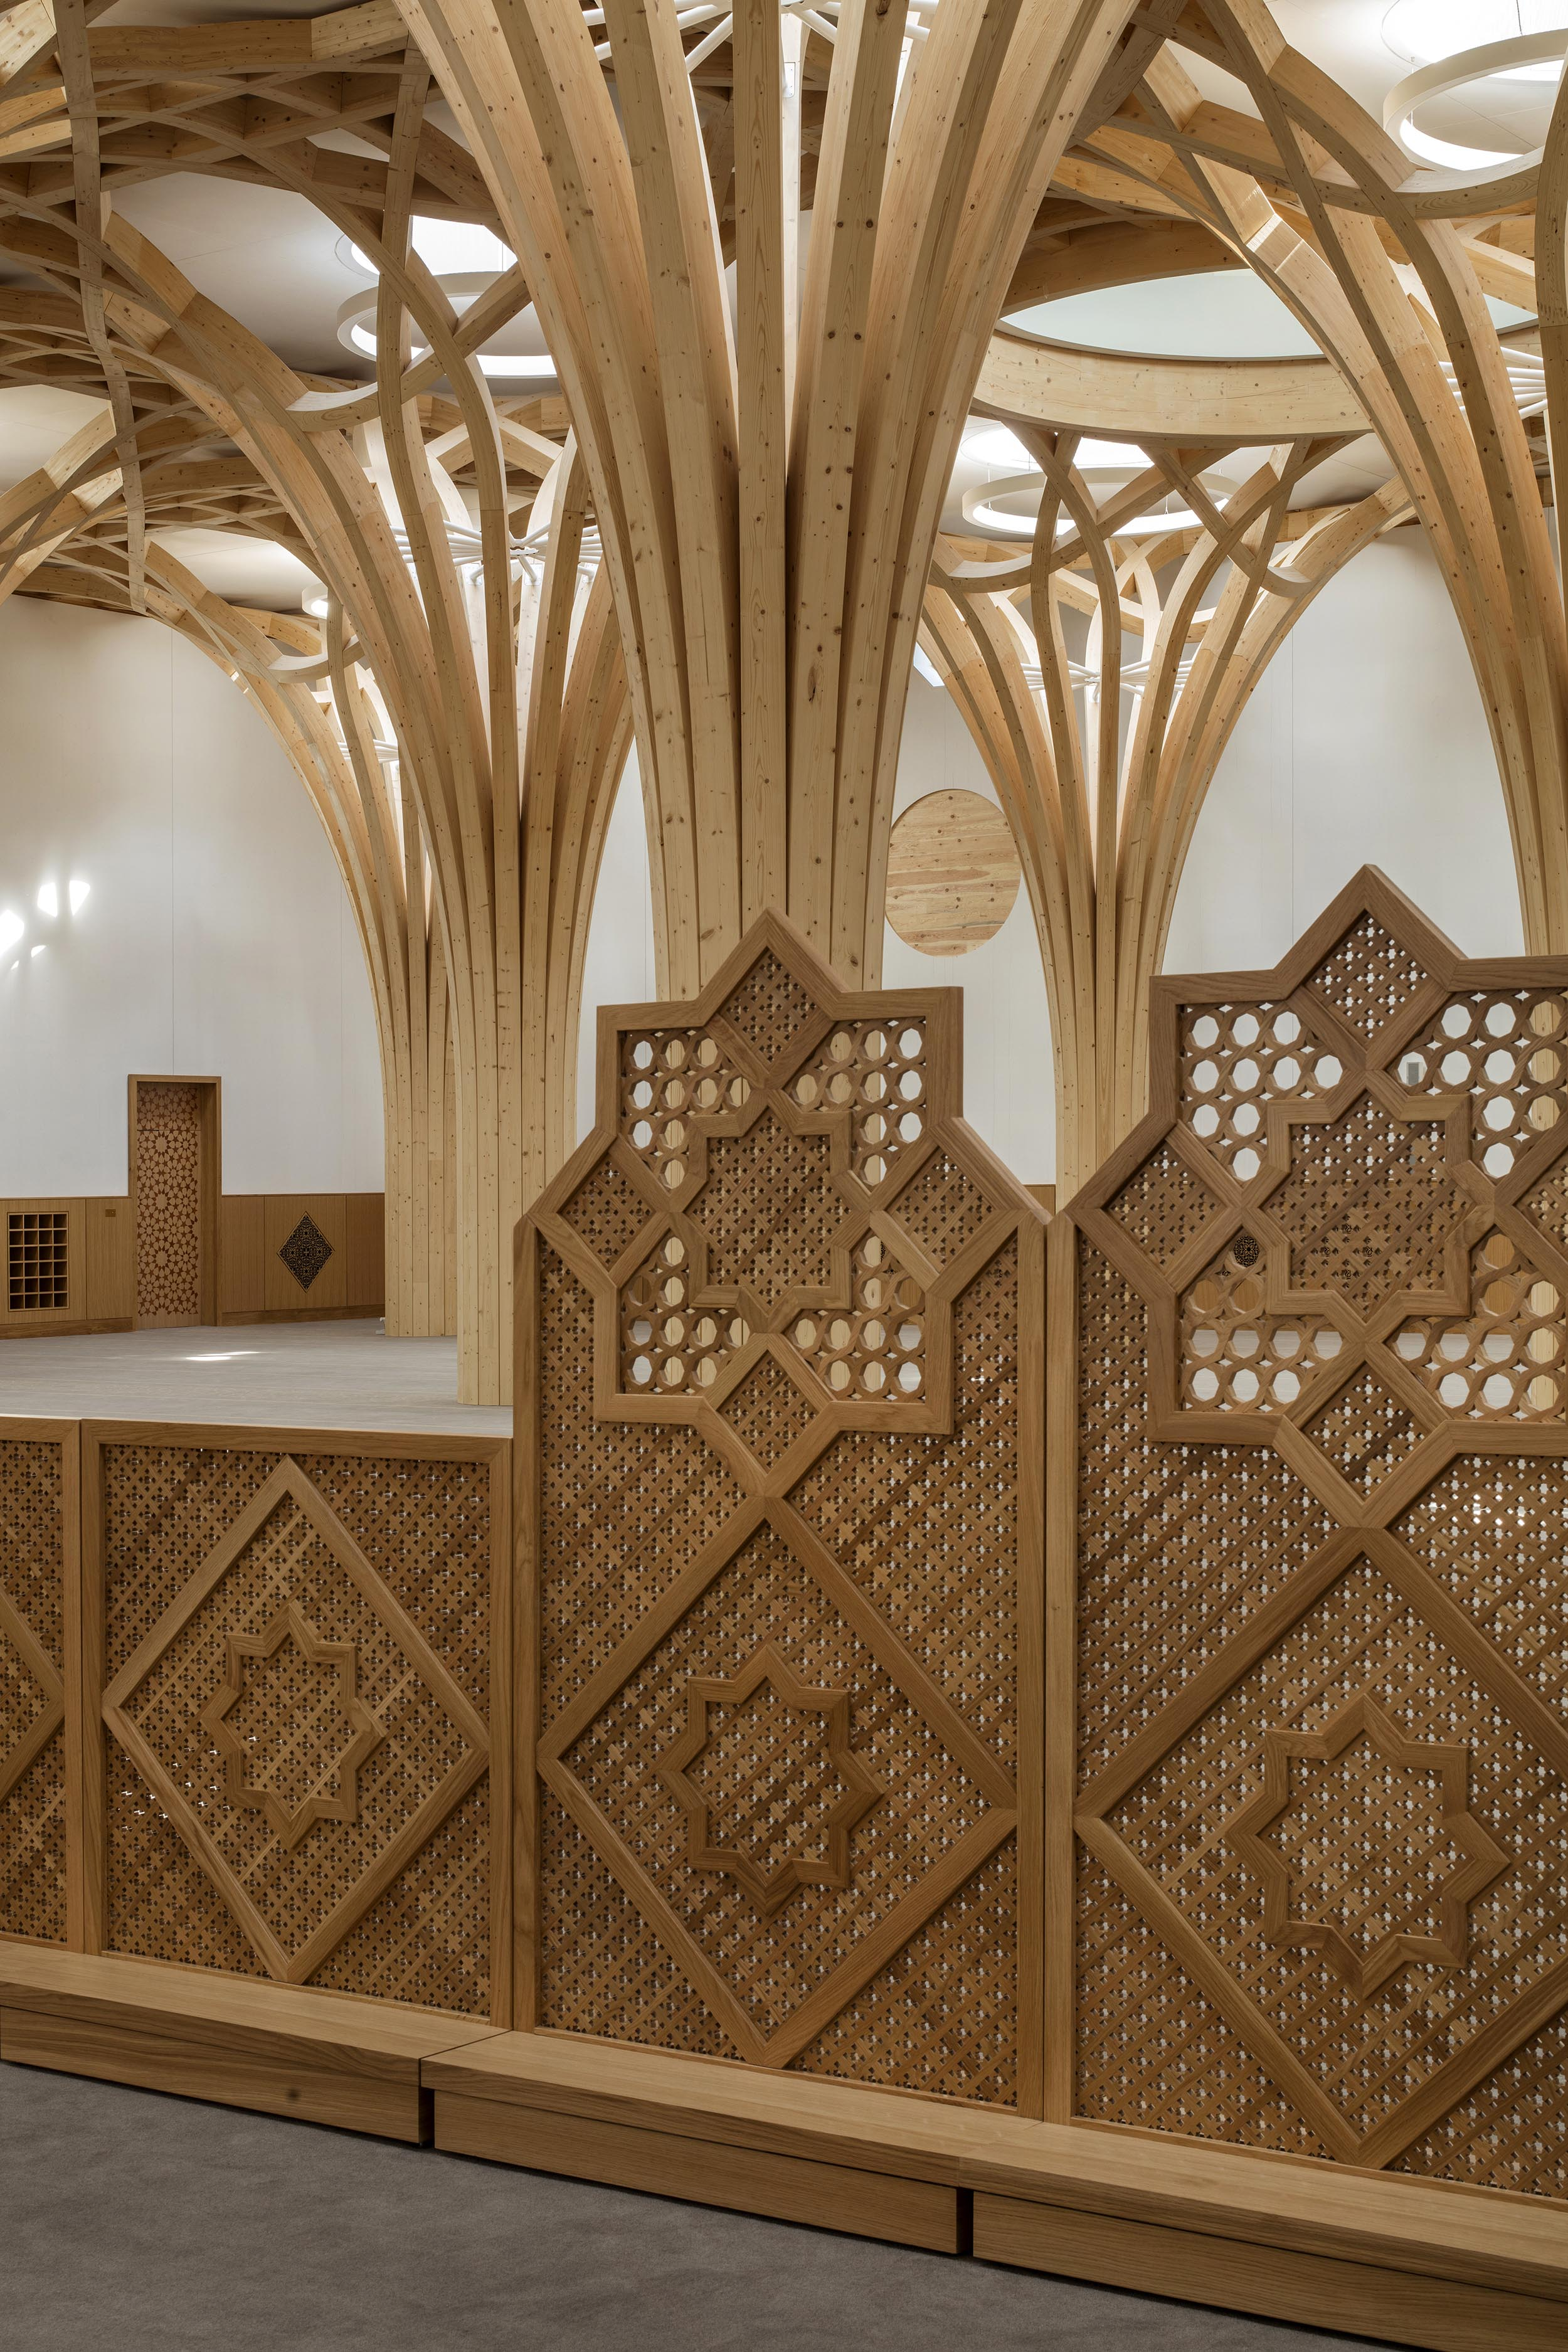 Cambridge Mosque - Mashrabiya screens in Prayer Hall - by Marks Barfield Architects, photo Morley von Sternberg